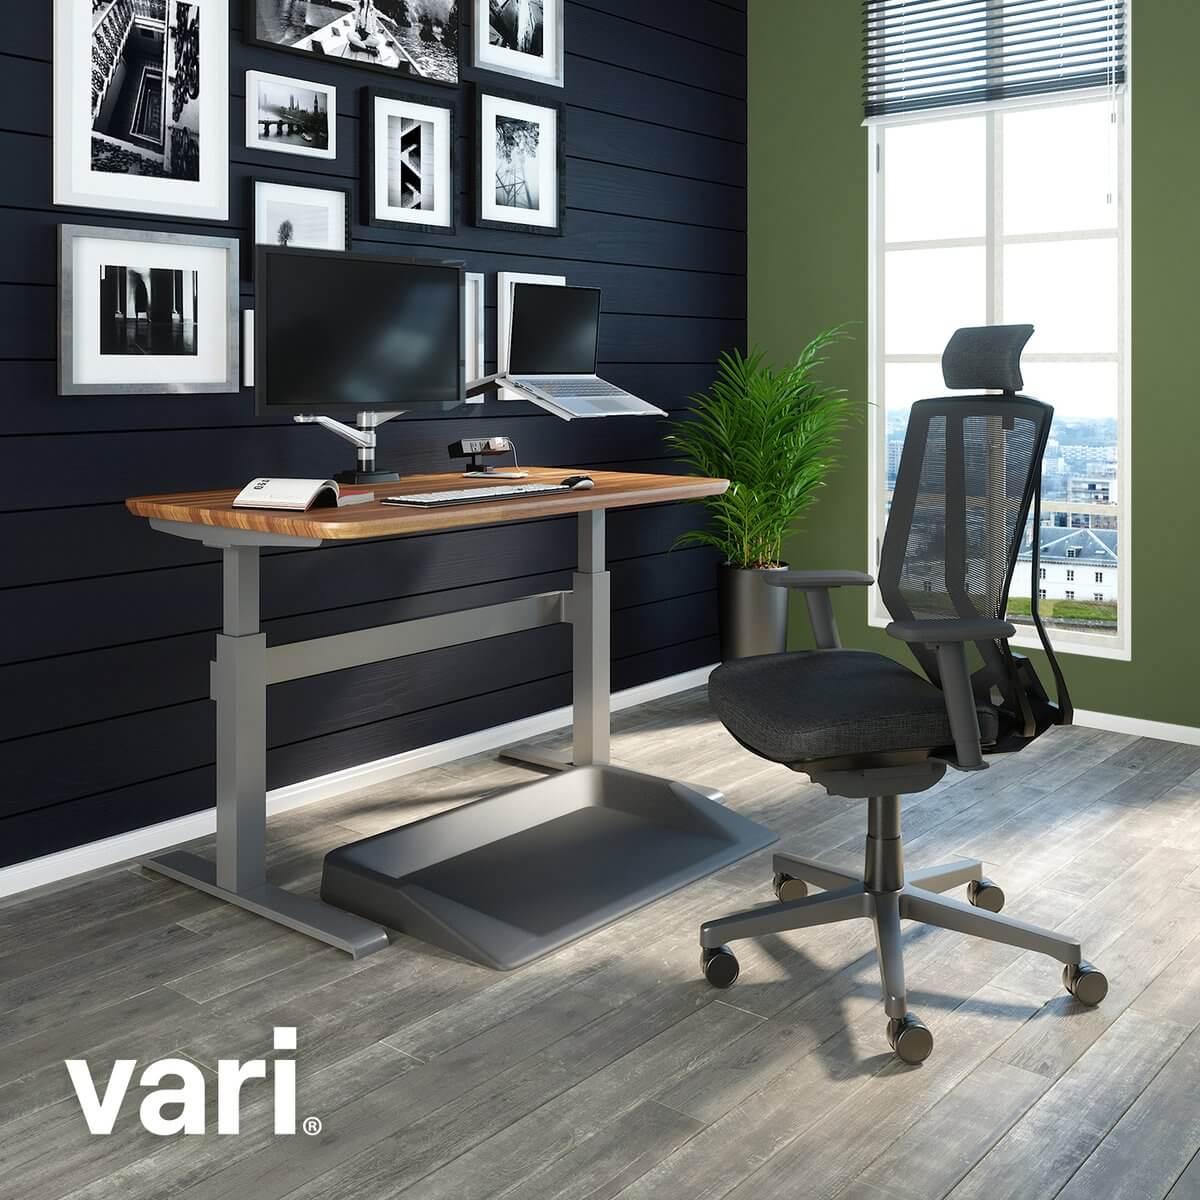 Varidesk - Vari electric stand up desk review